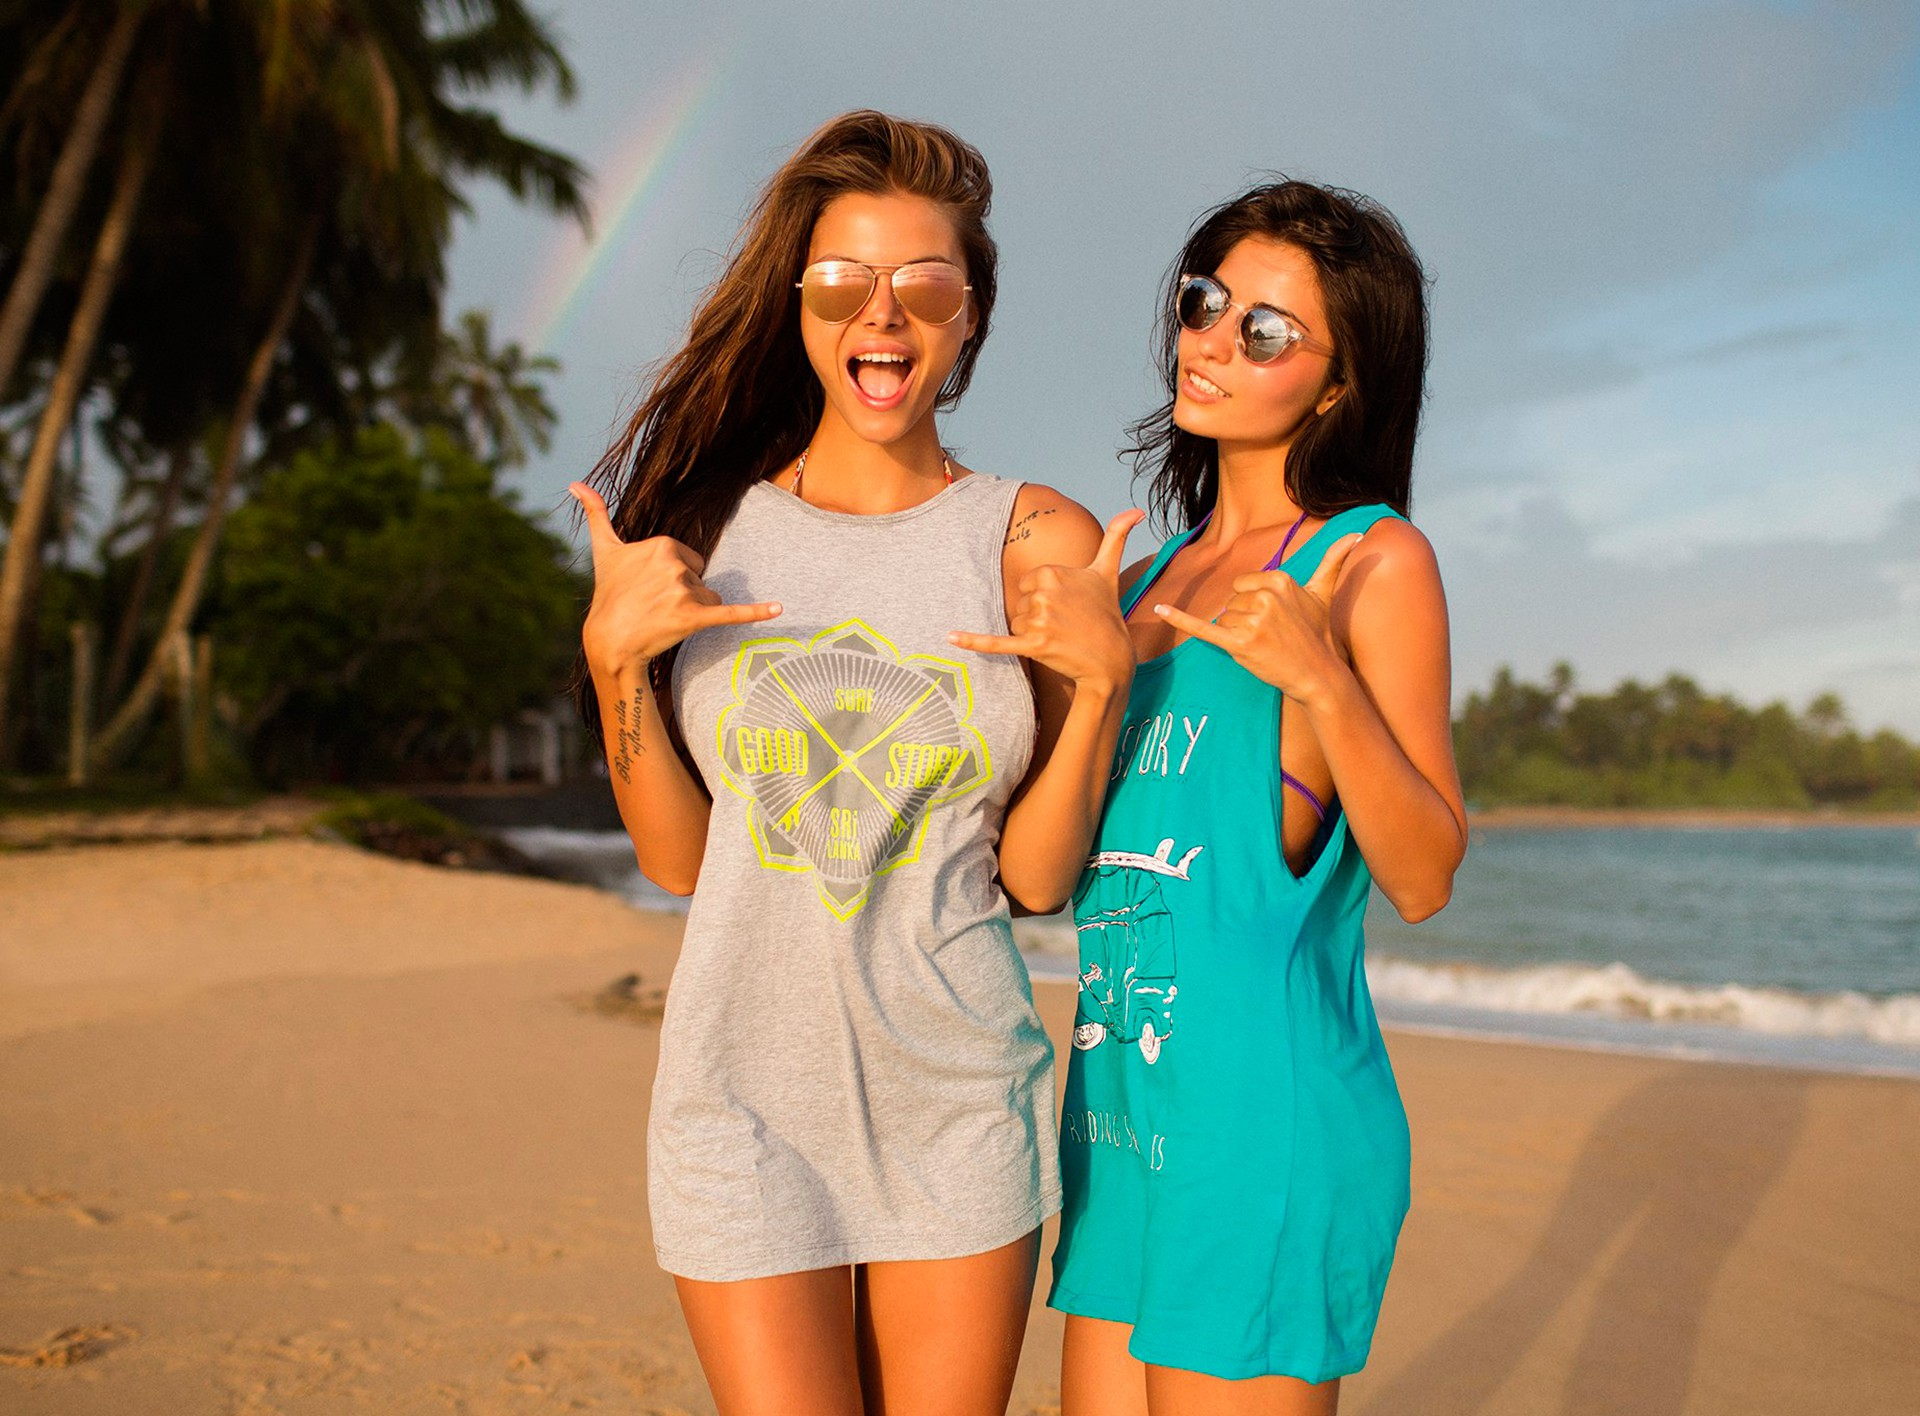 Фото двух девушек брюнеток 6 фотография